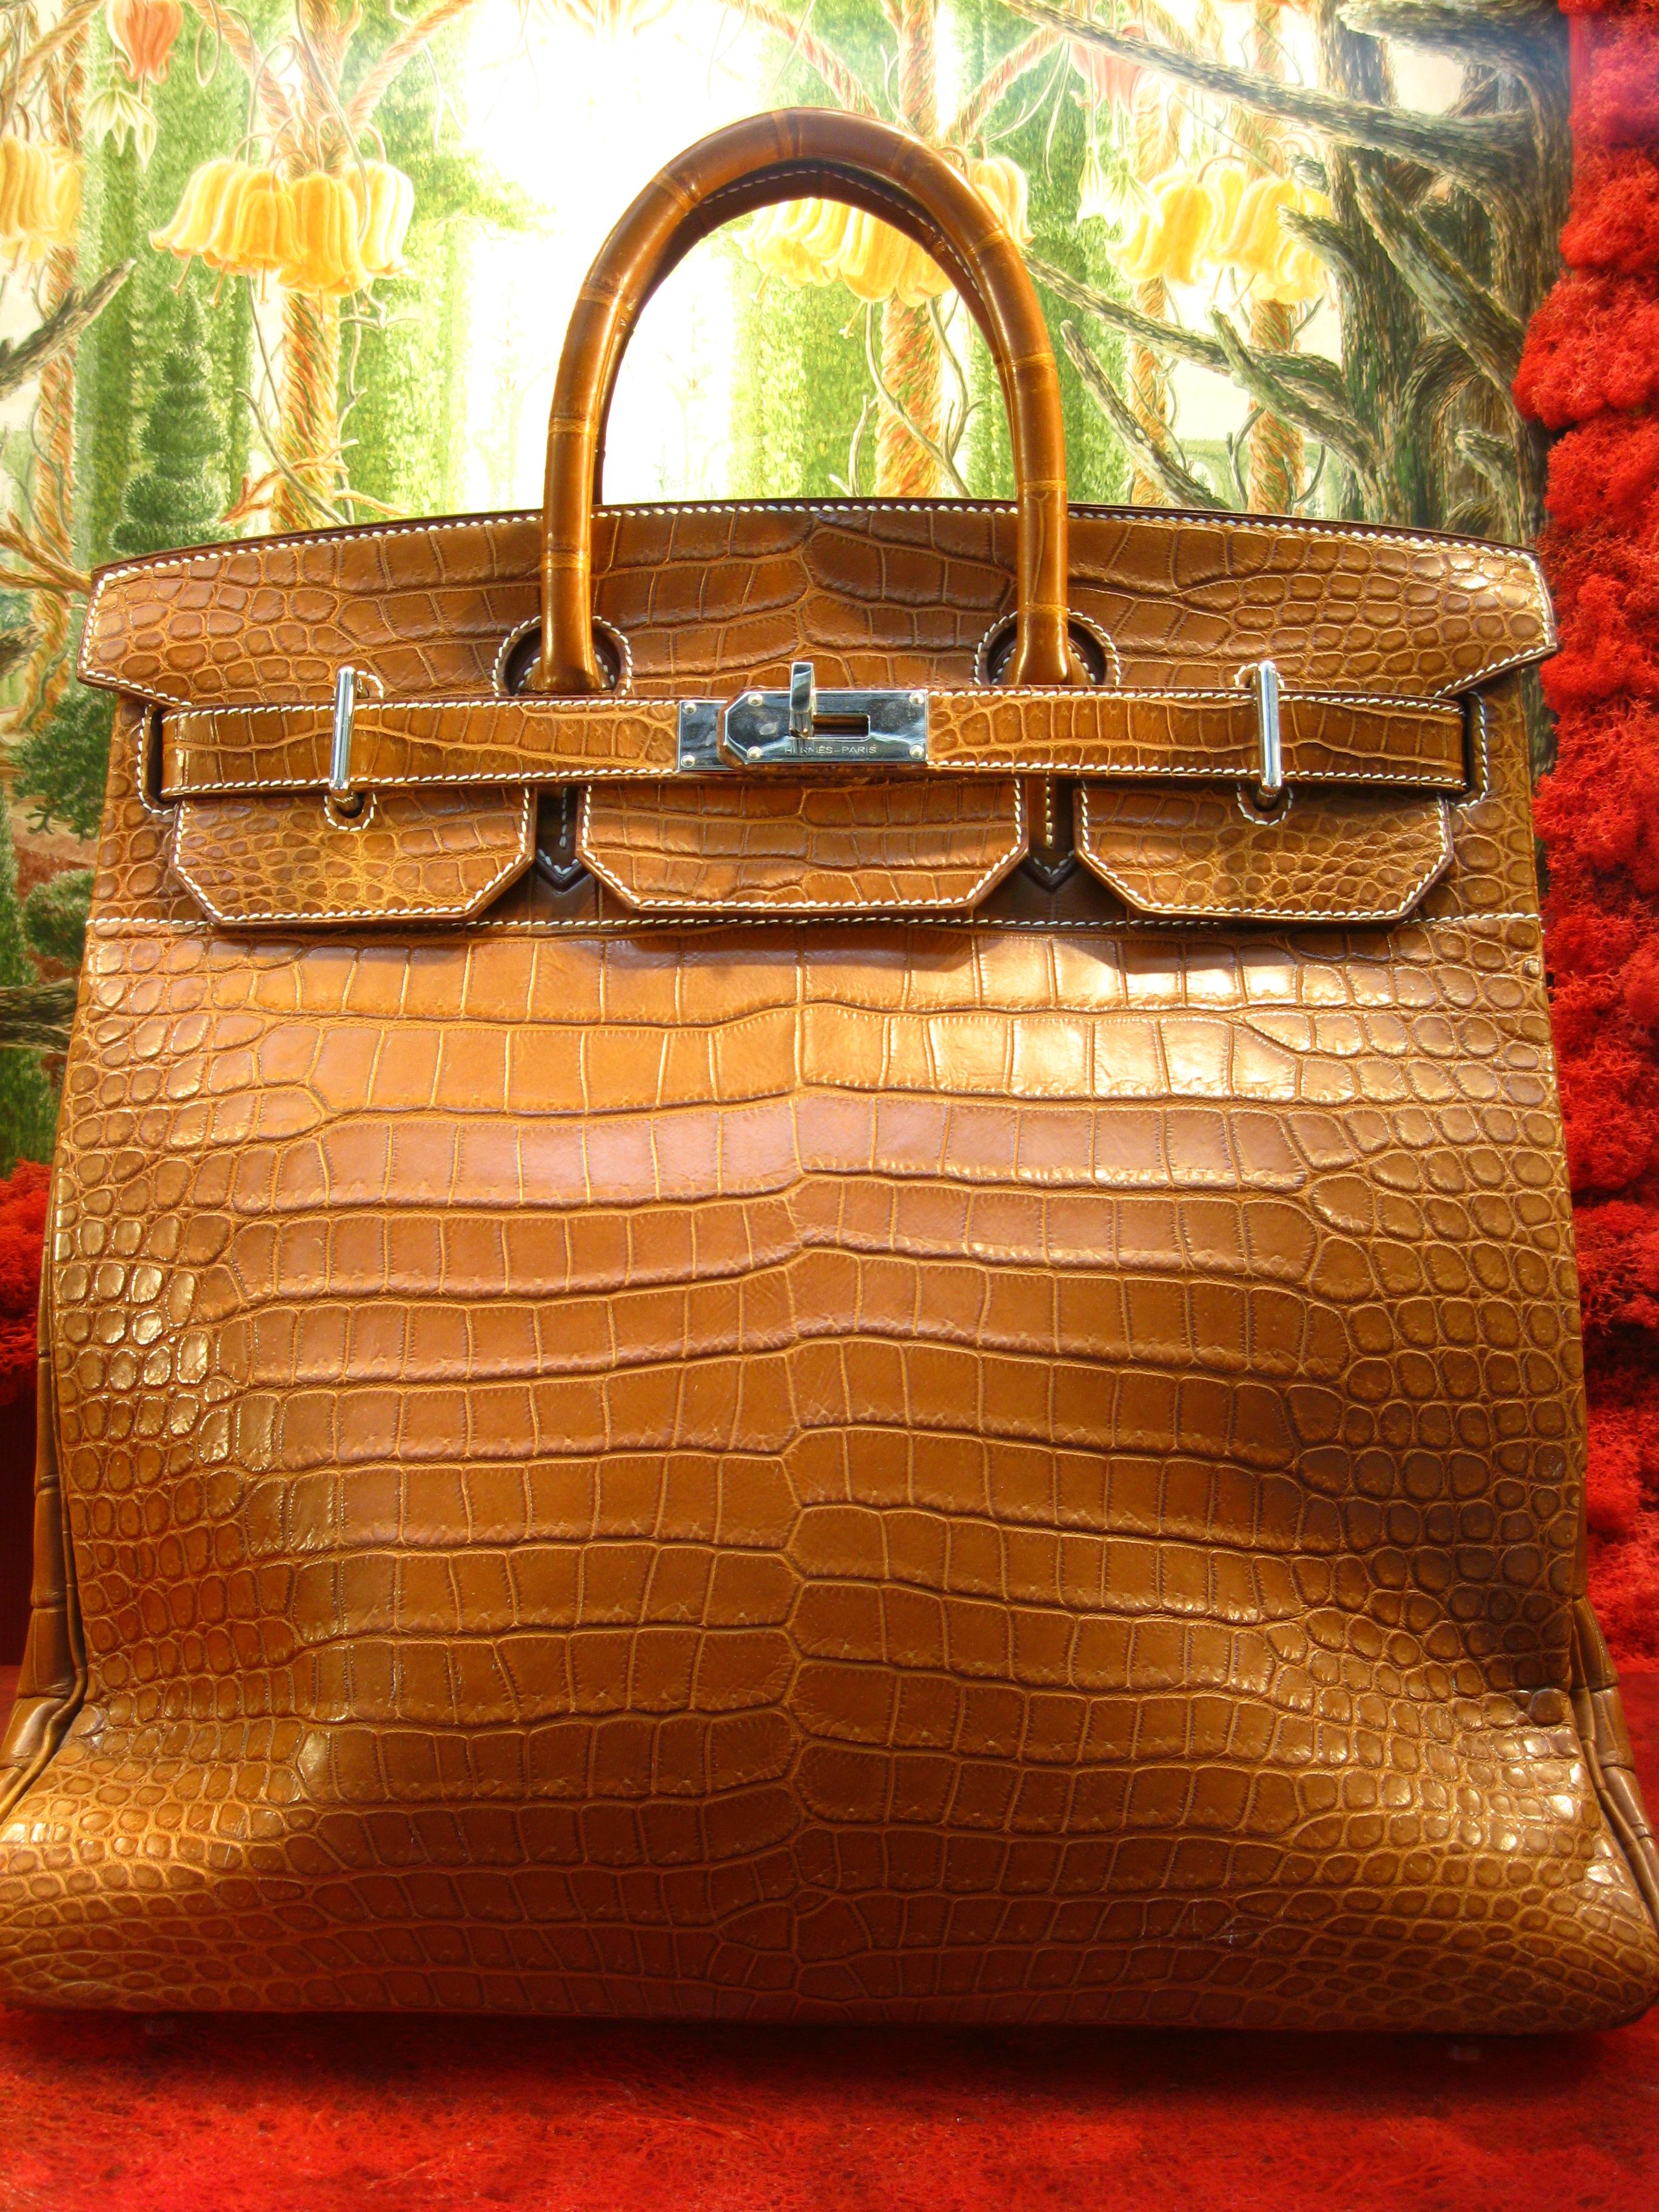 Hermes сумка на кулисках